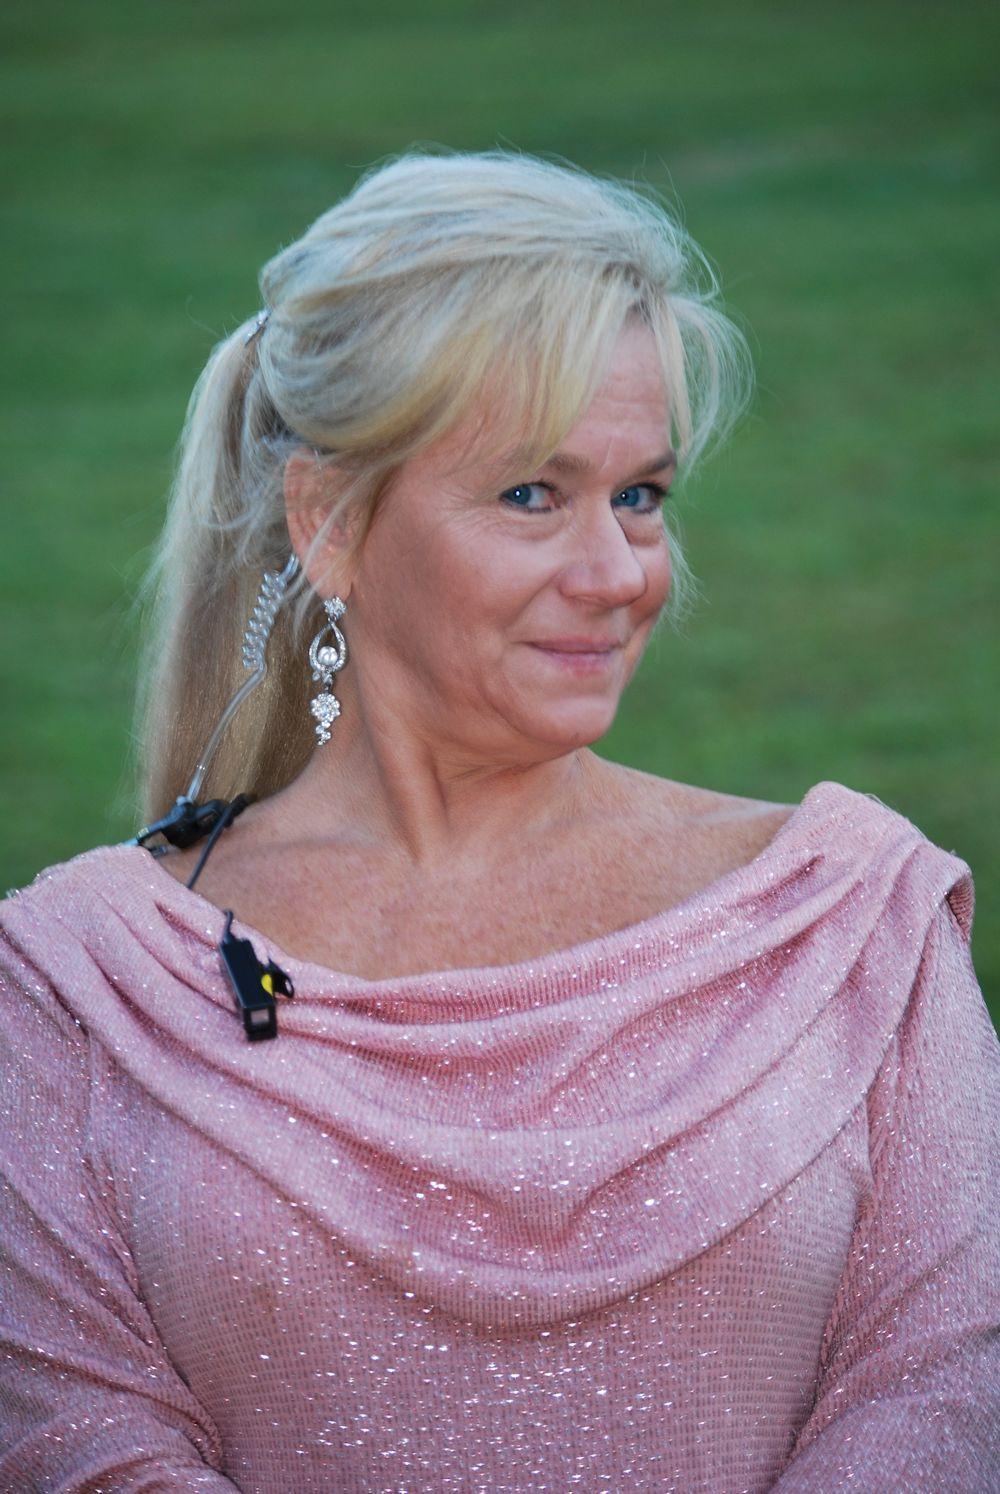 Waterfall Wedding Expert - Cyndi Durham